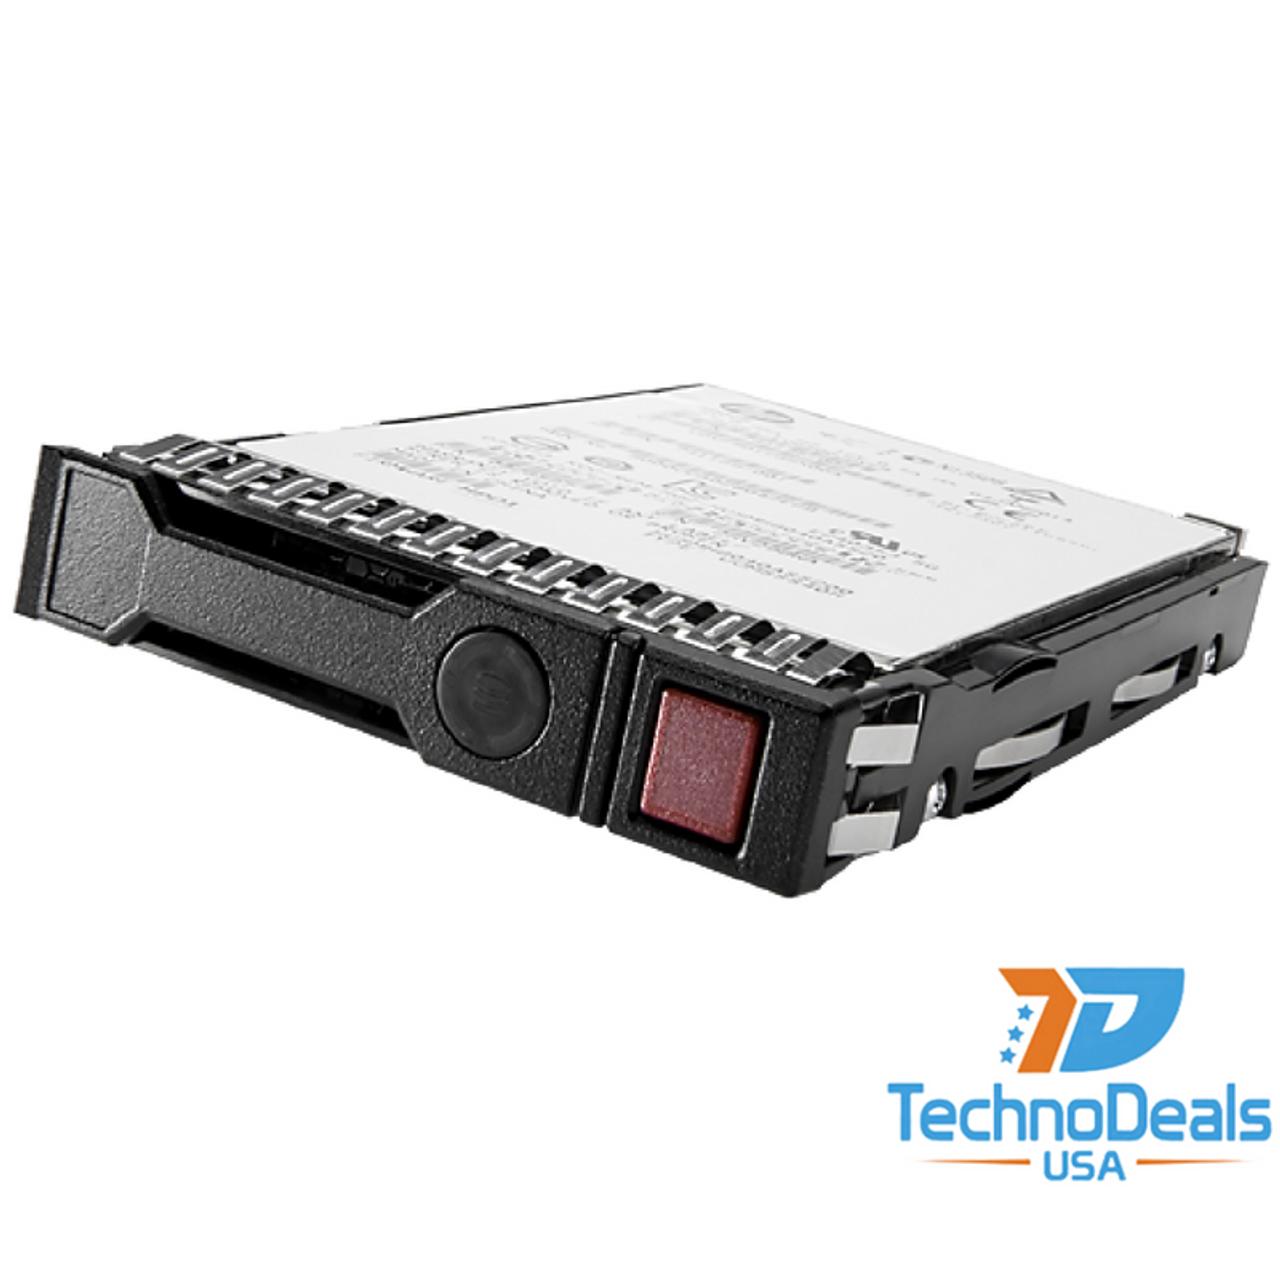 "NEW HPE J9F48A 787648-001 MSA 1.2TB 12G SAS 10K SFF 2.5/"" DP HP HDD Hard Drive"